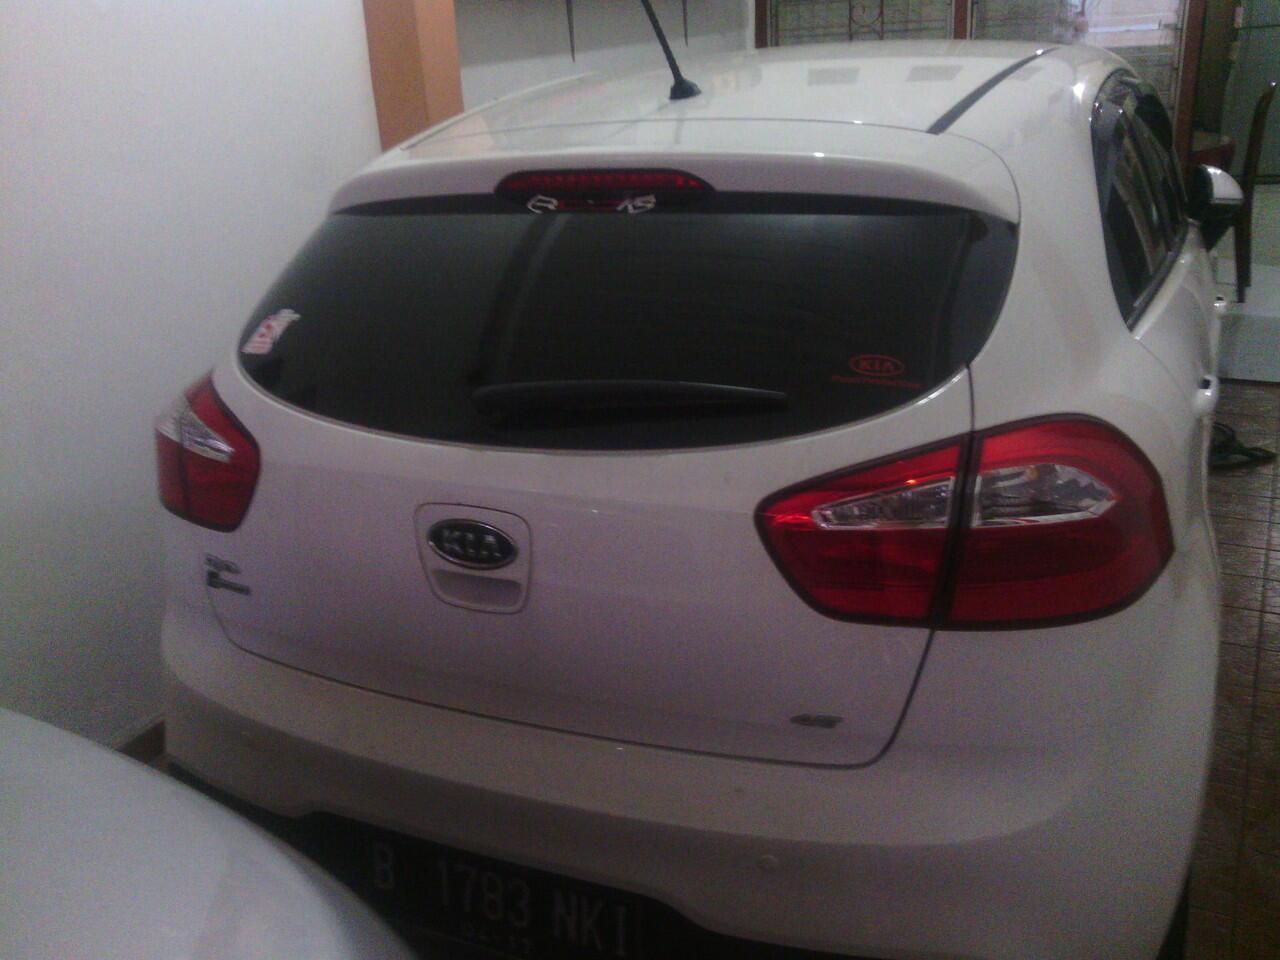 For Sale! KIA RIO 2012 (Pajak bln 4) AT/ WHITE PEARL/ KM 27K